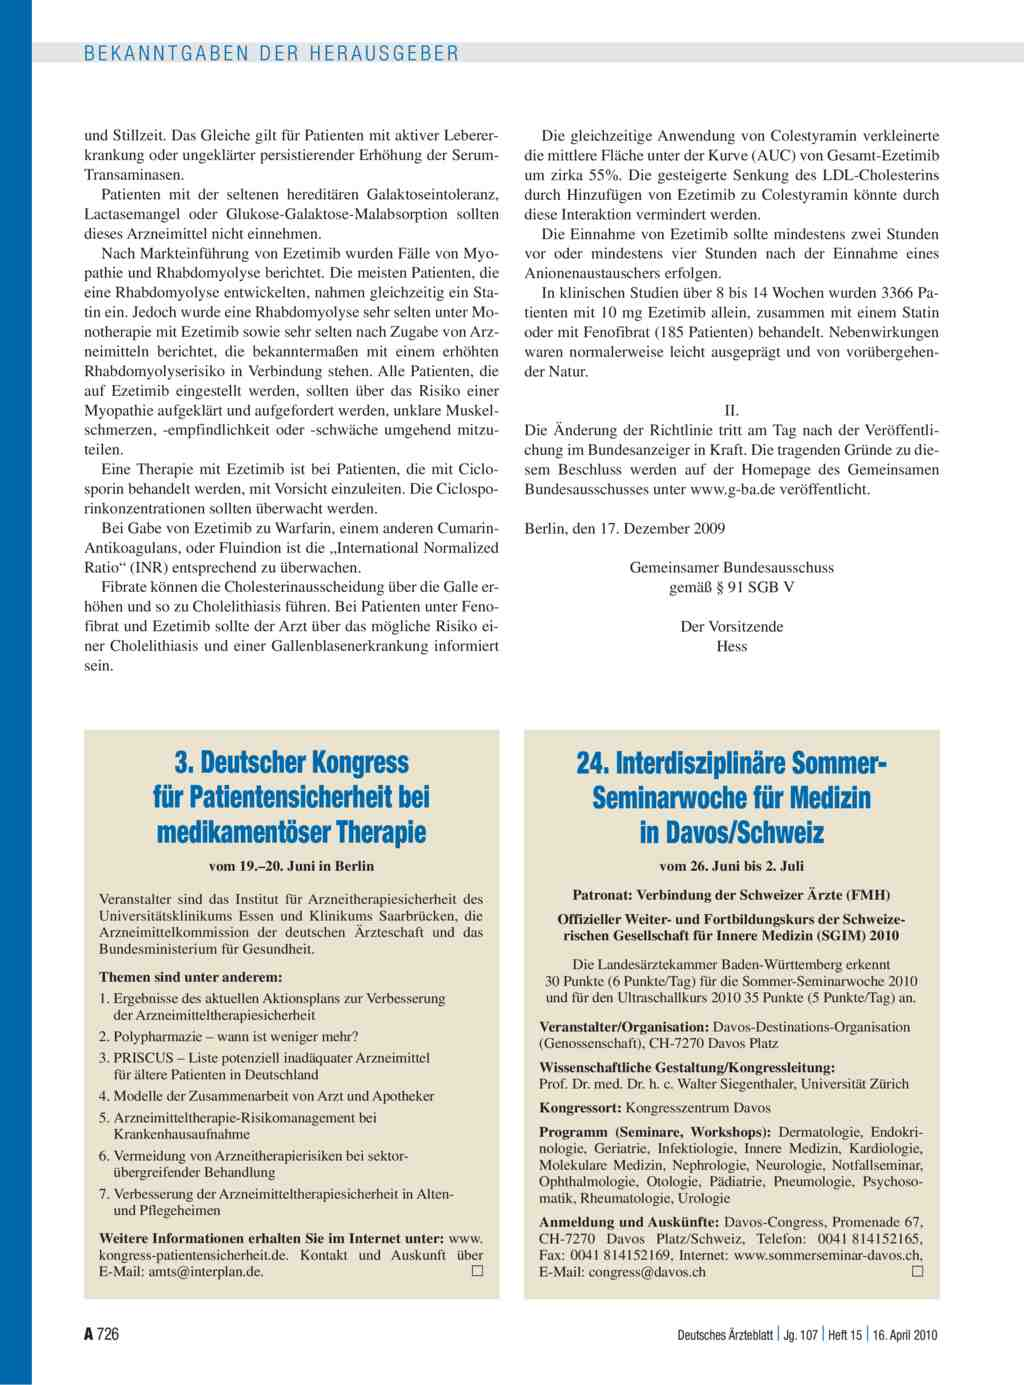 24 interdisziplin re sommer seminarwoche f r medizin in for Medizin studieren schweiz